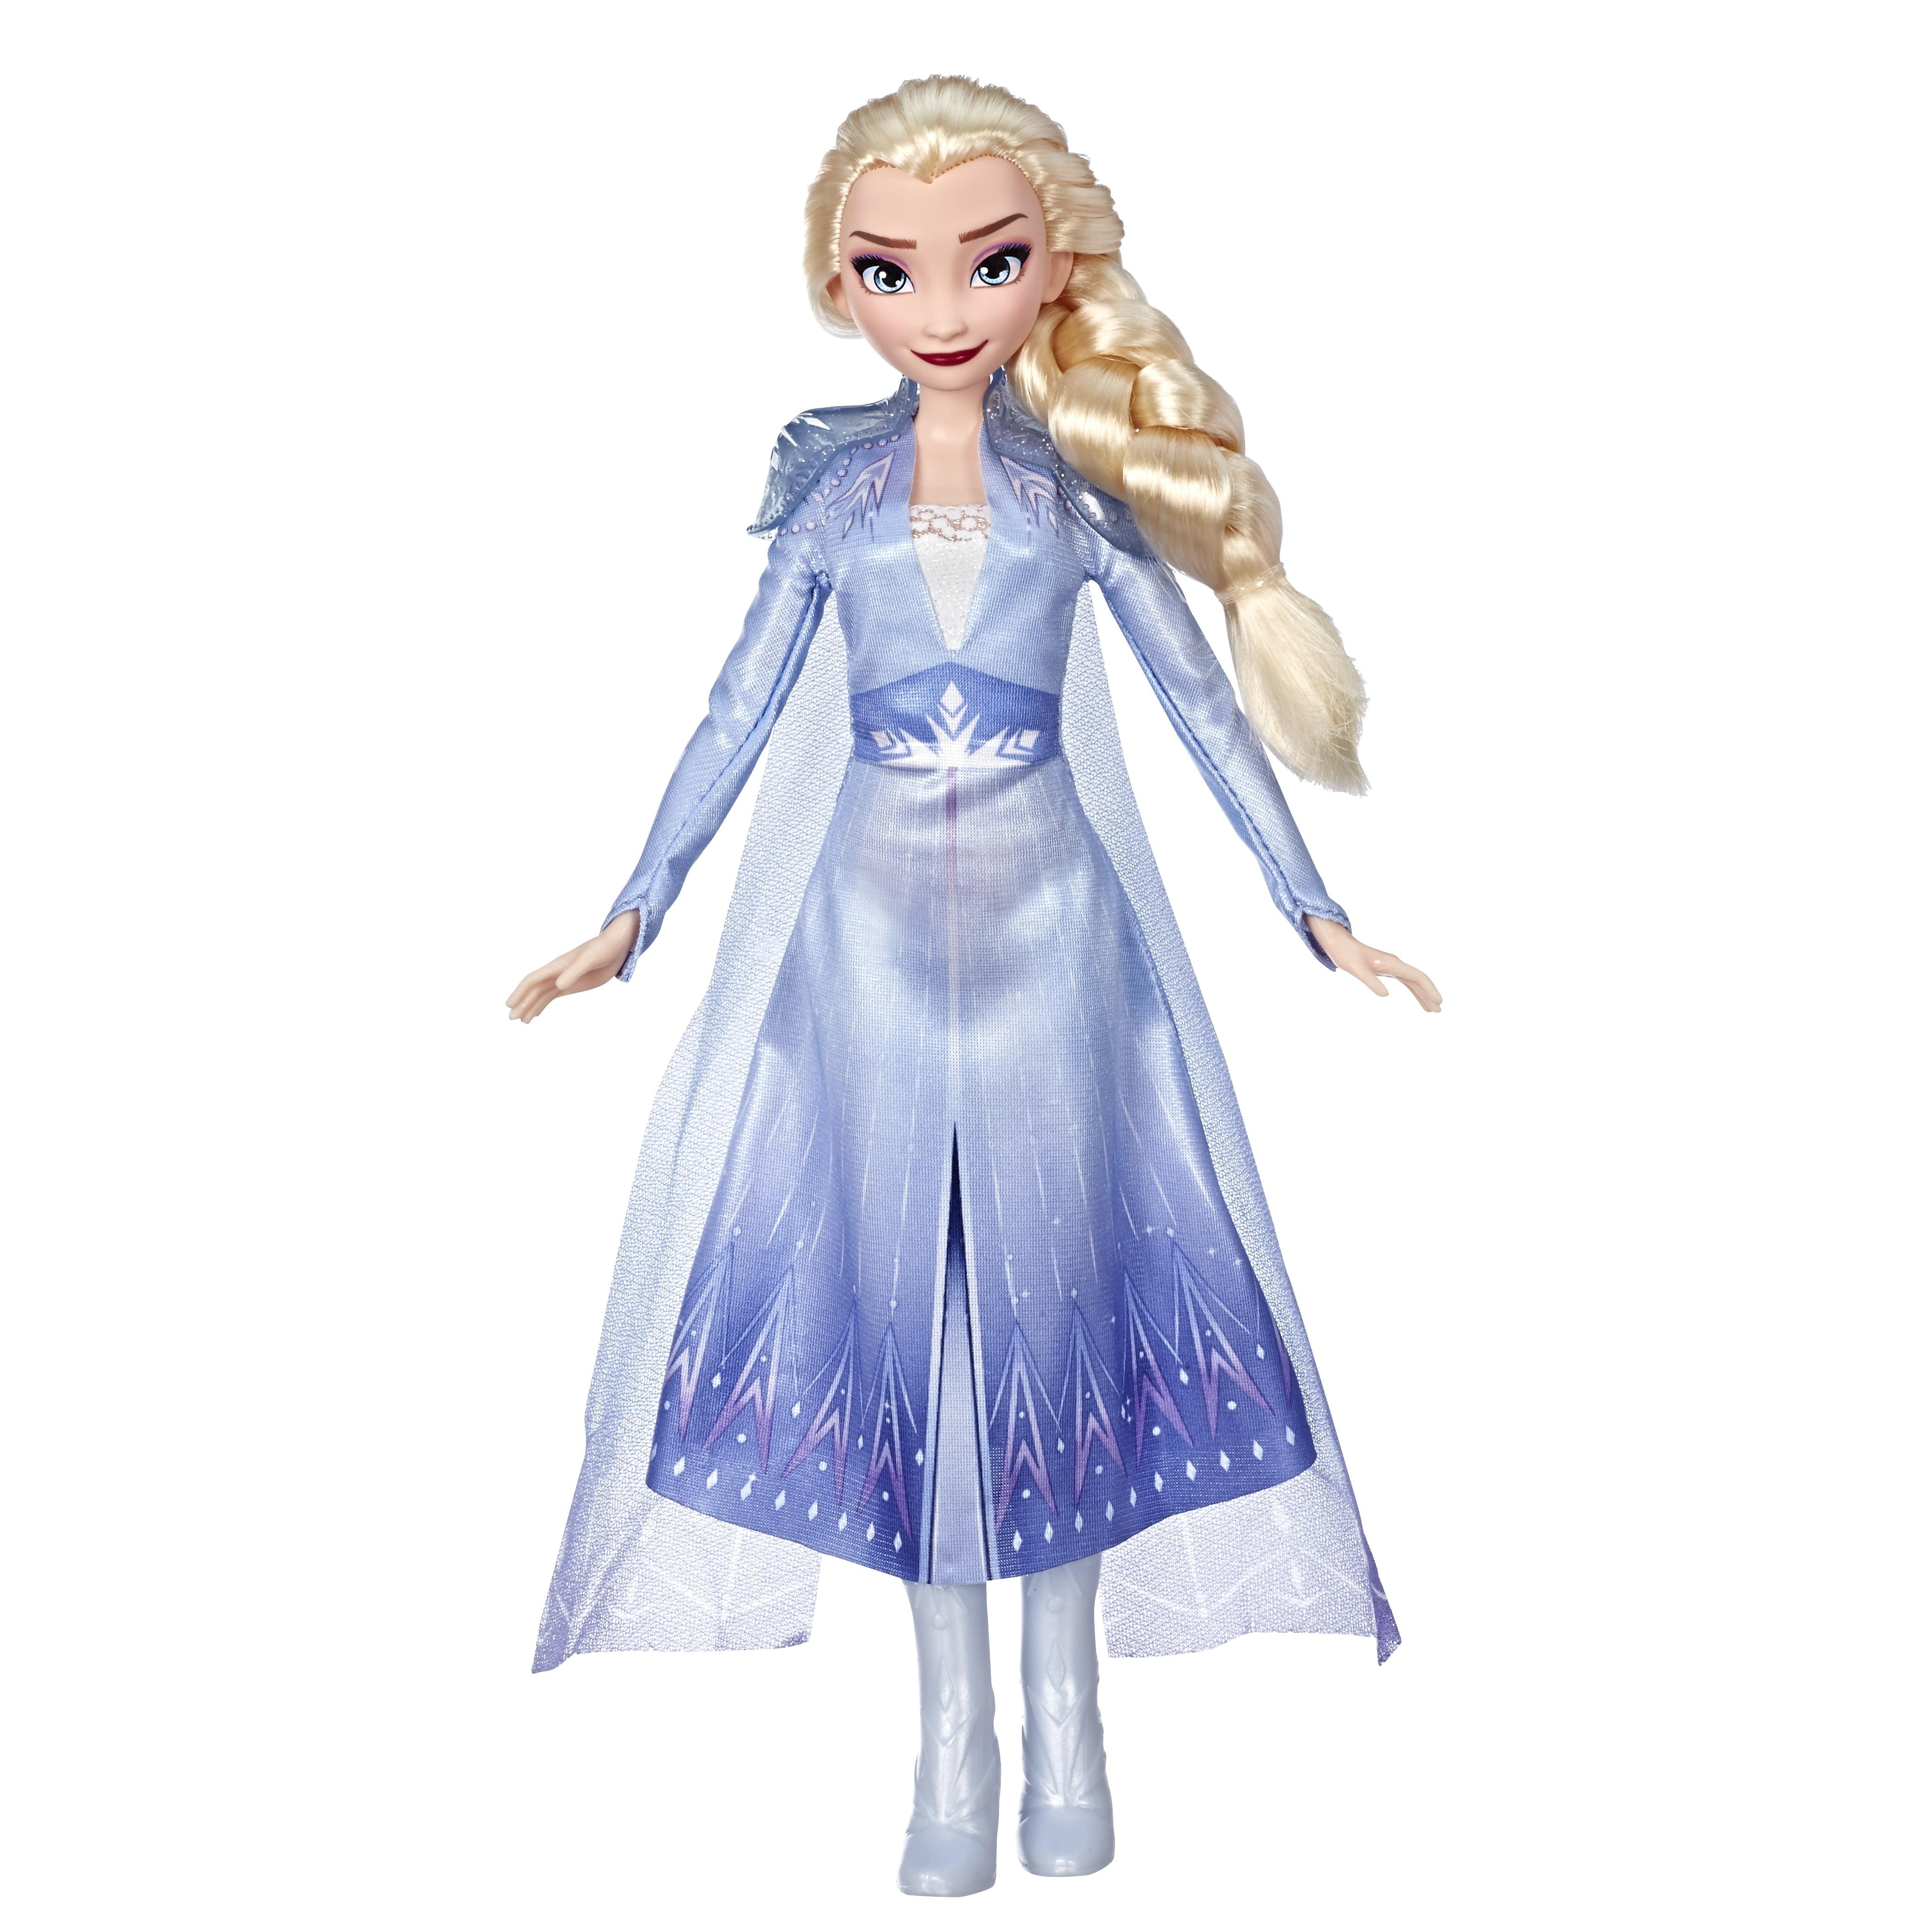 E6709 FRZ Elsa Fashion Doll OOP